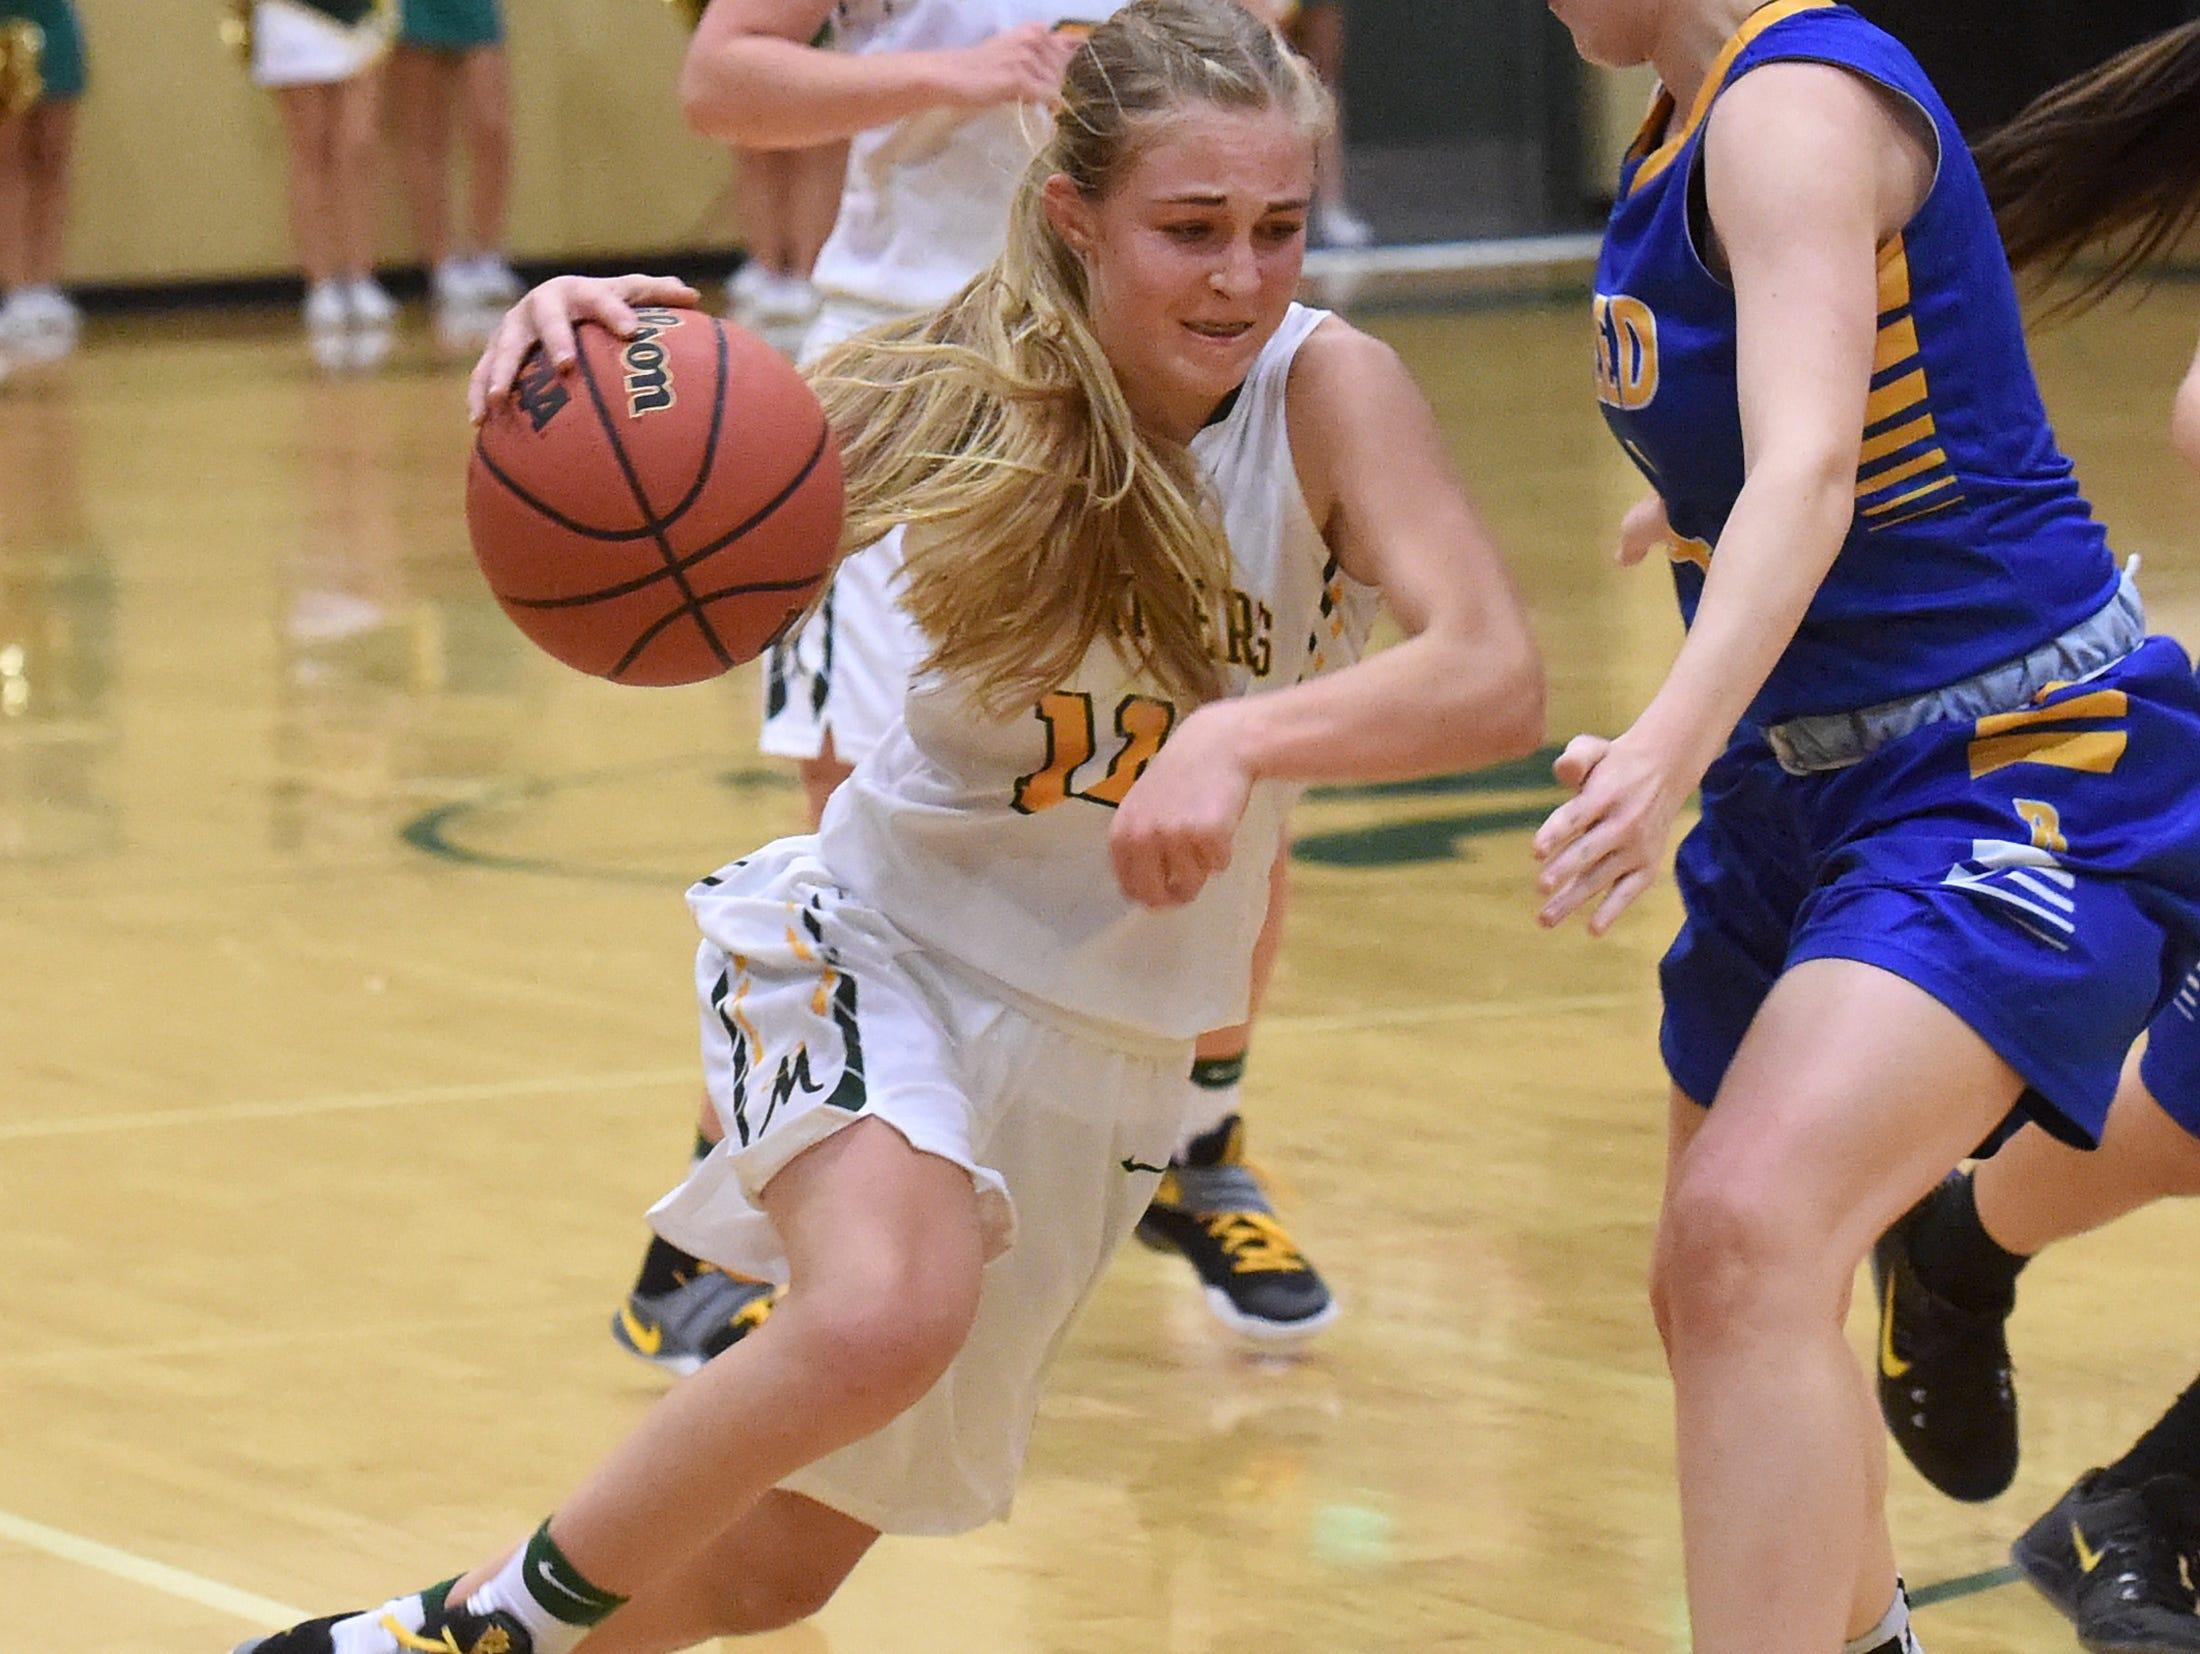 Bishop Manogue freshman Kenna Holt is on the All-USA Northern Nevada 4A basketball team.